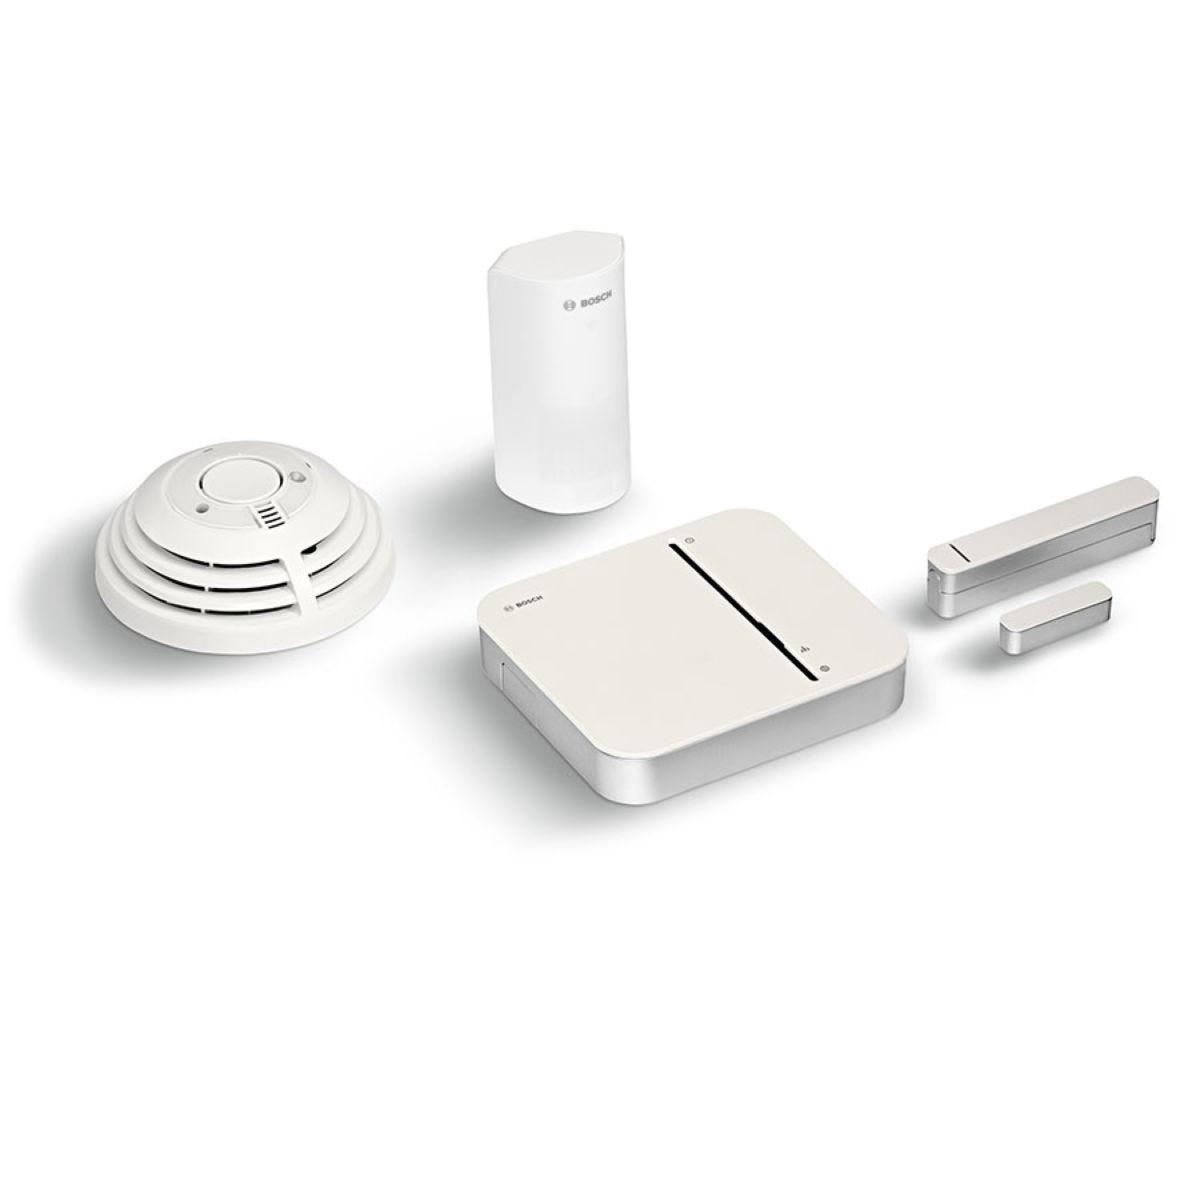 Bosch Smart Home Security Starter Kit